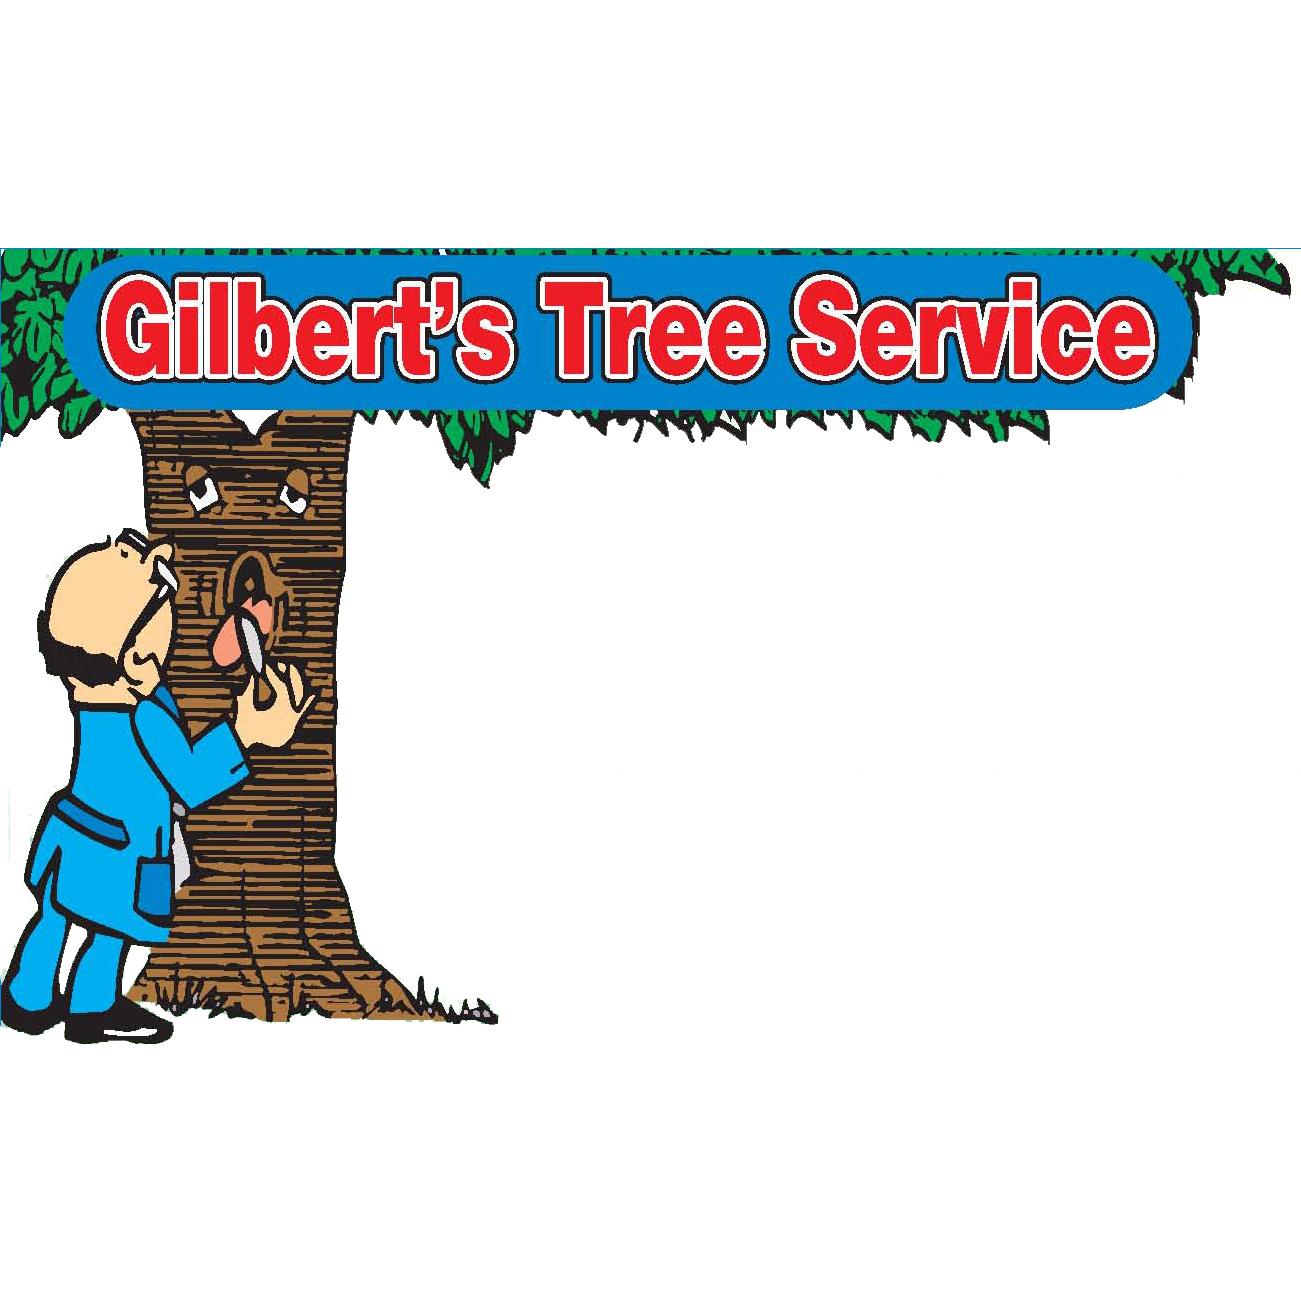 Gilbert's Tree Service